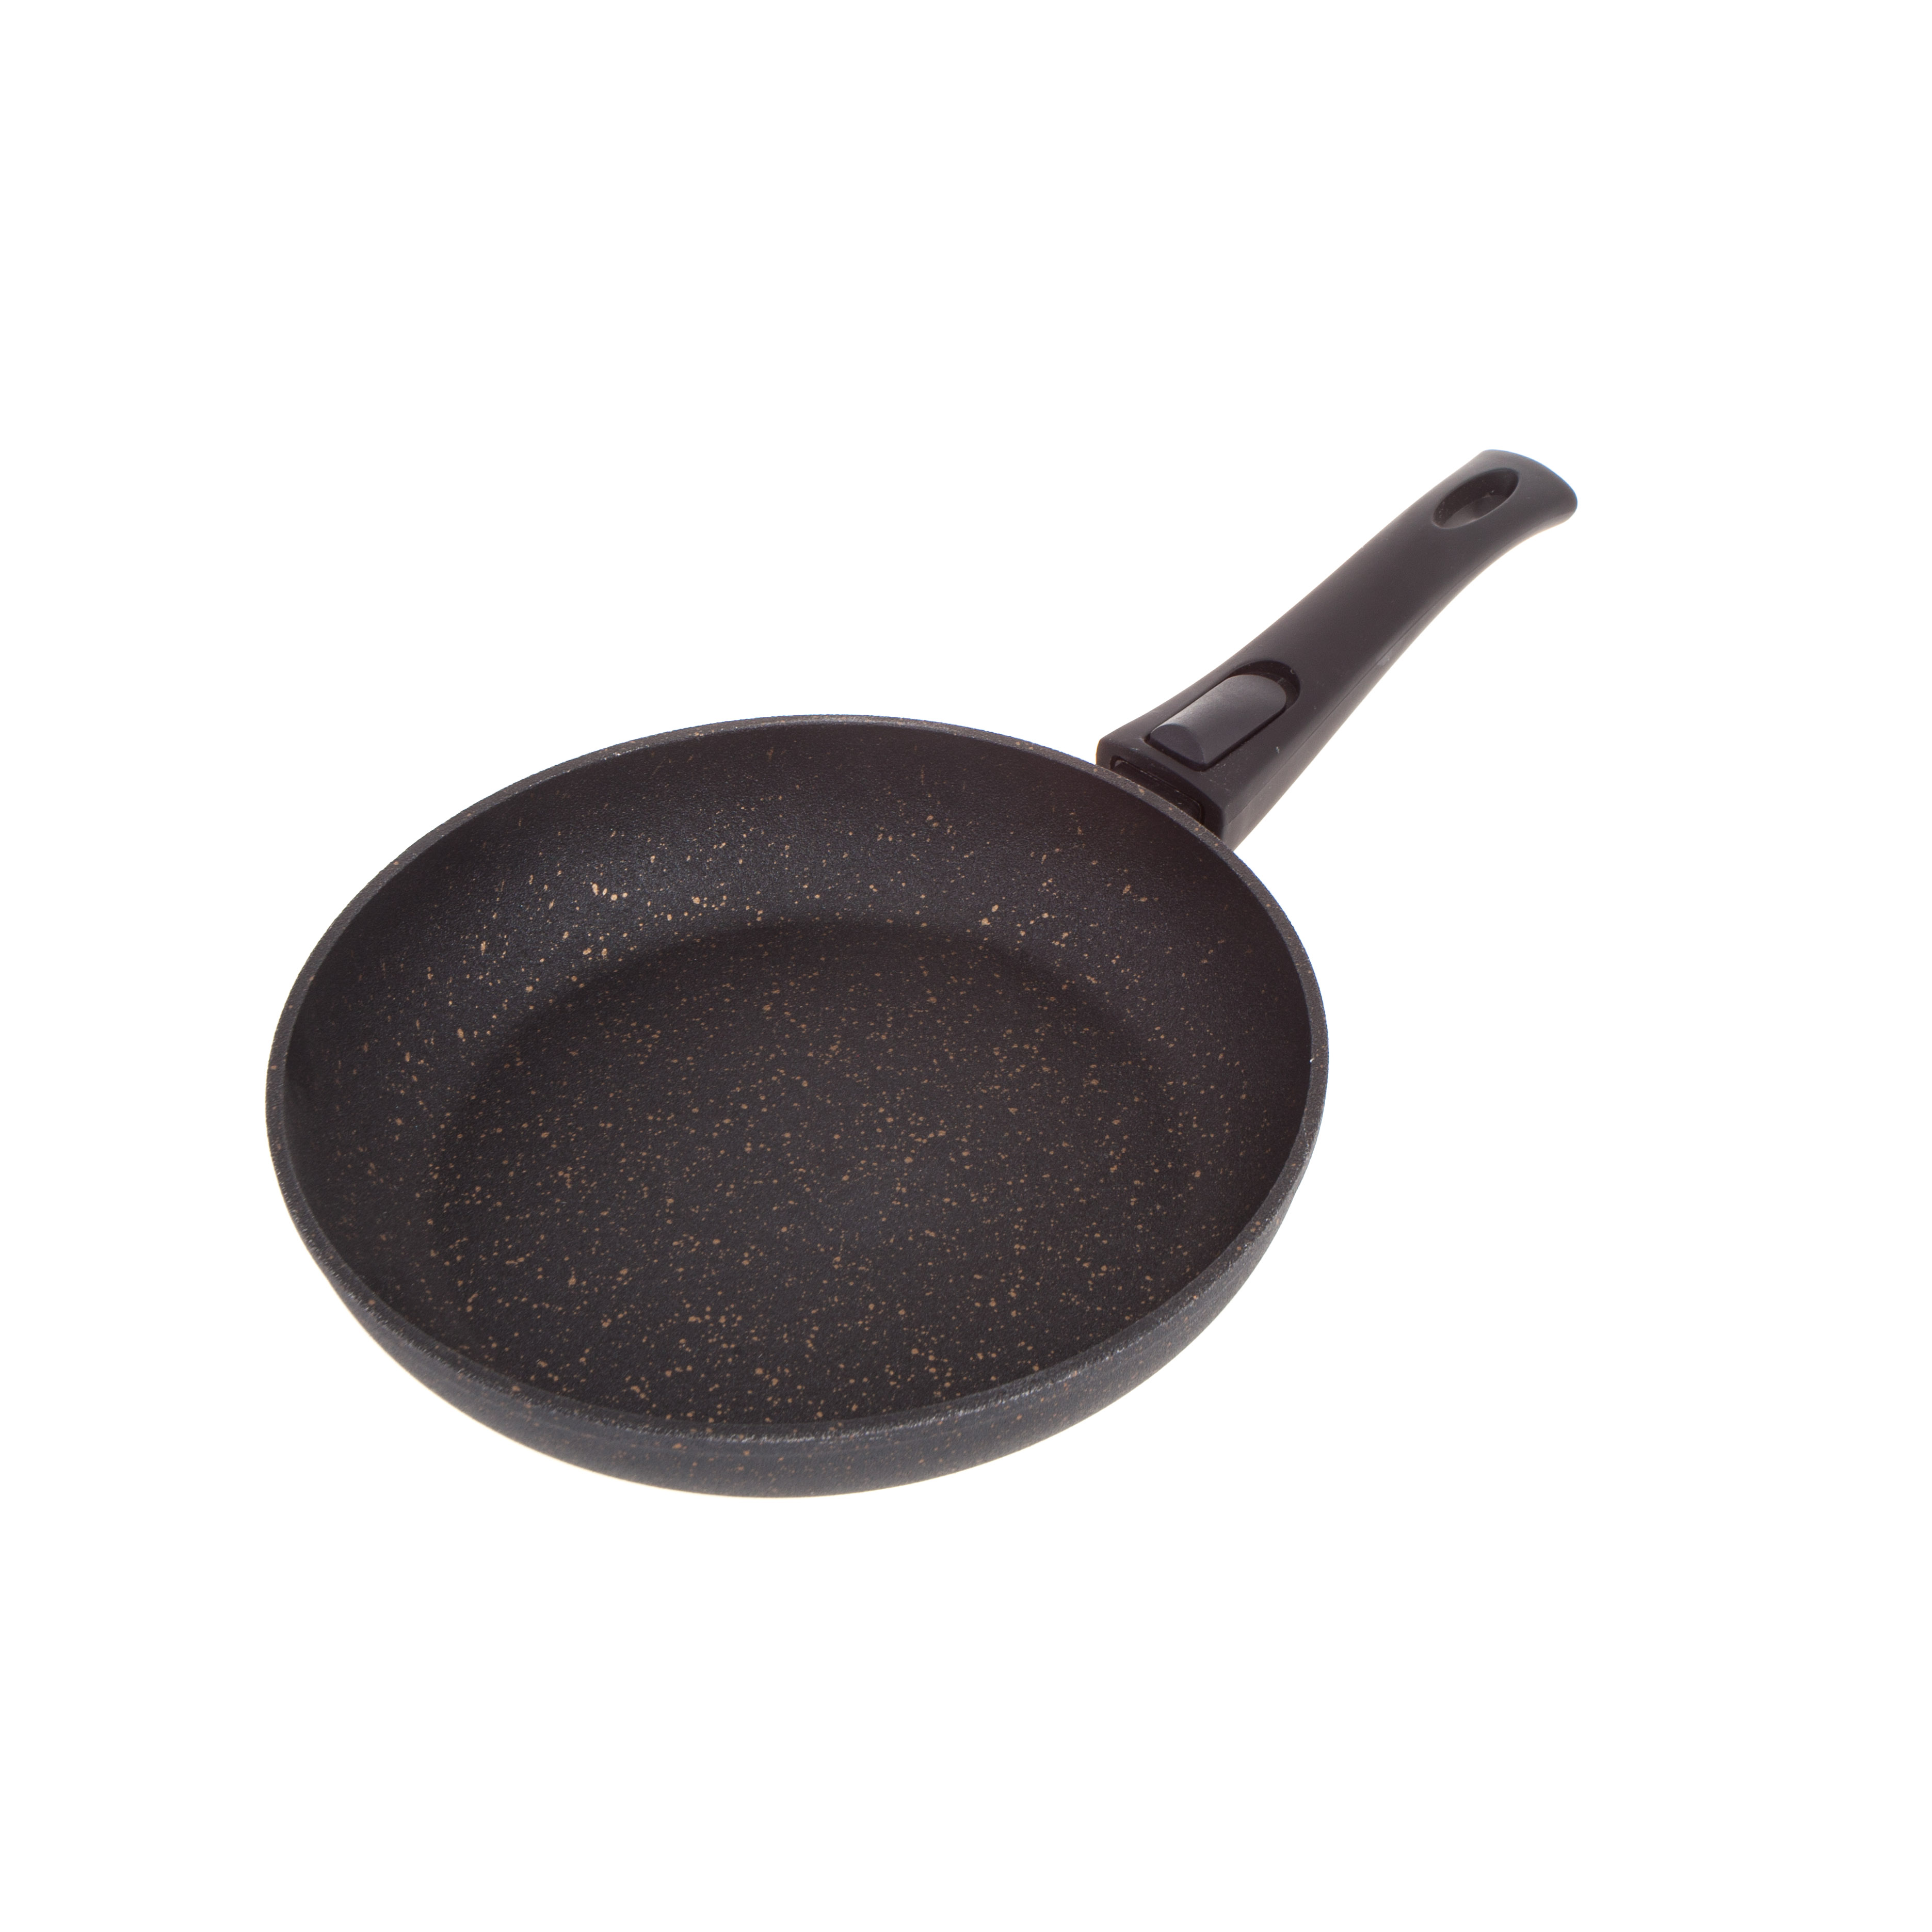 Сковорода Fissman Black Cosmic 24 см сковорода d 24 см kukmara кофейный мрамор смки240а